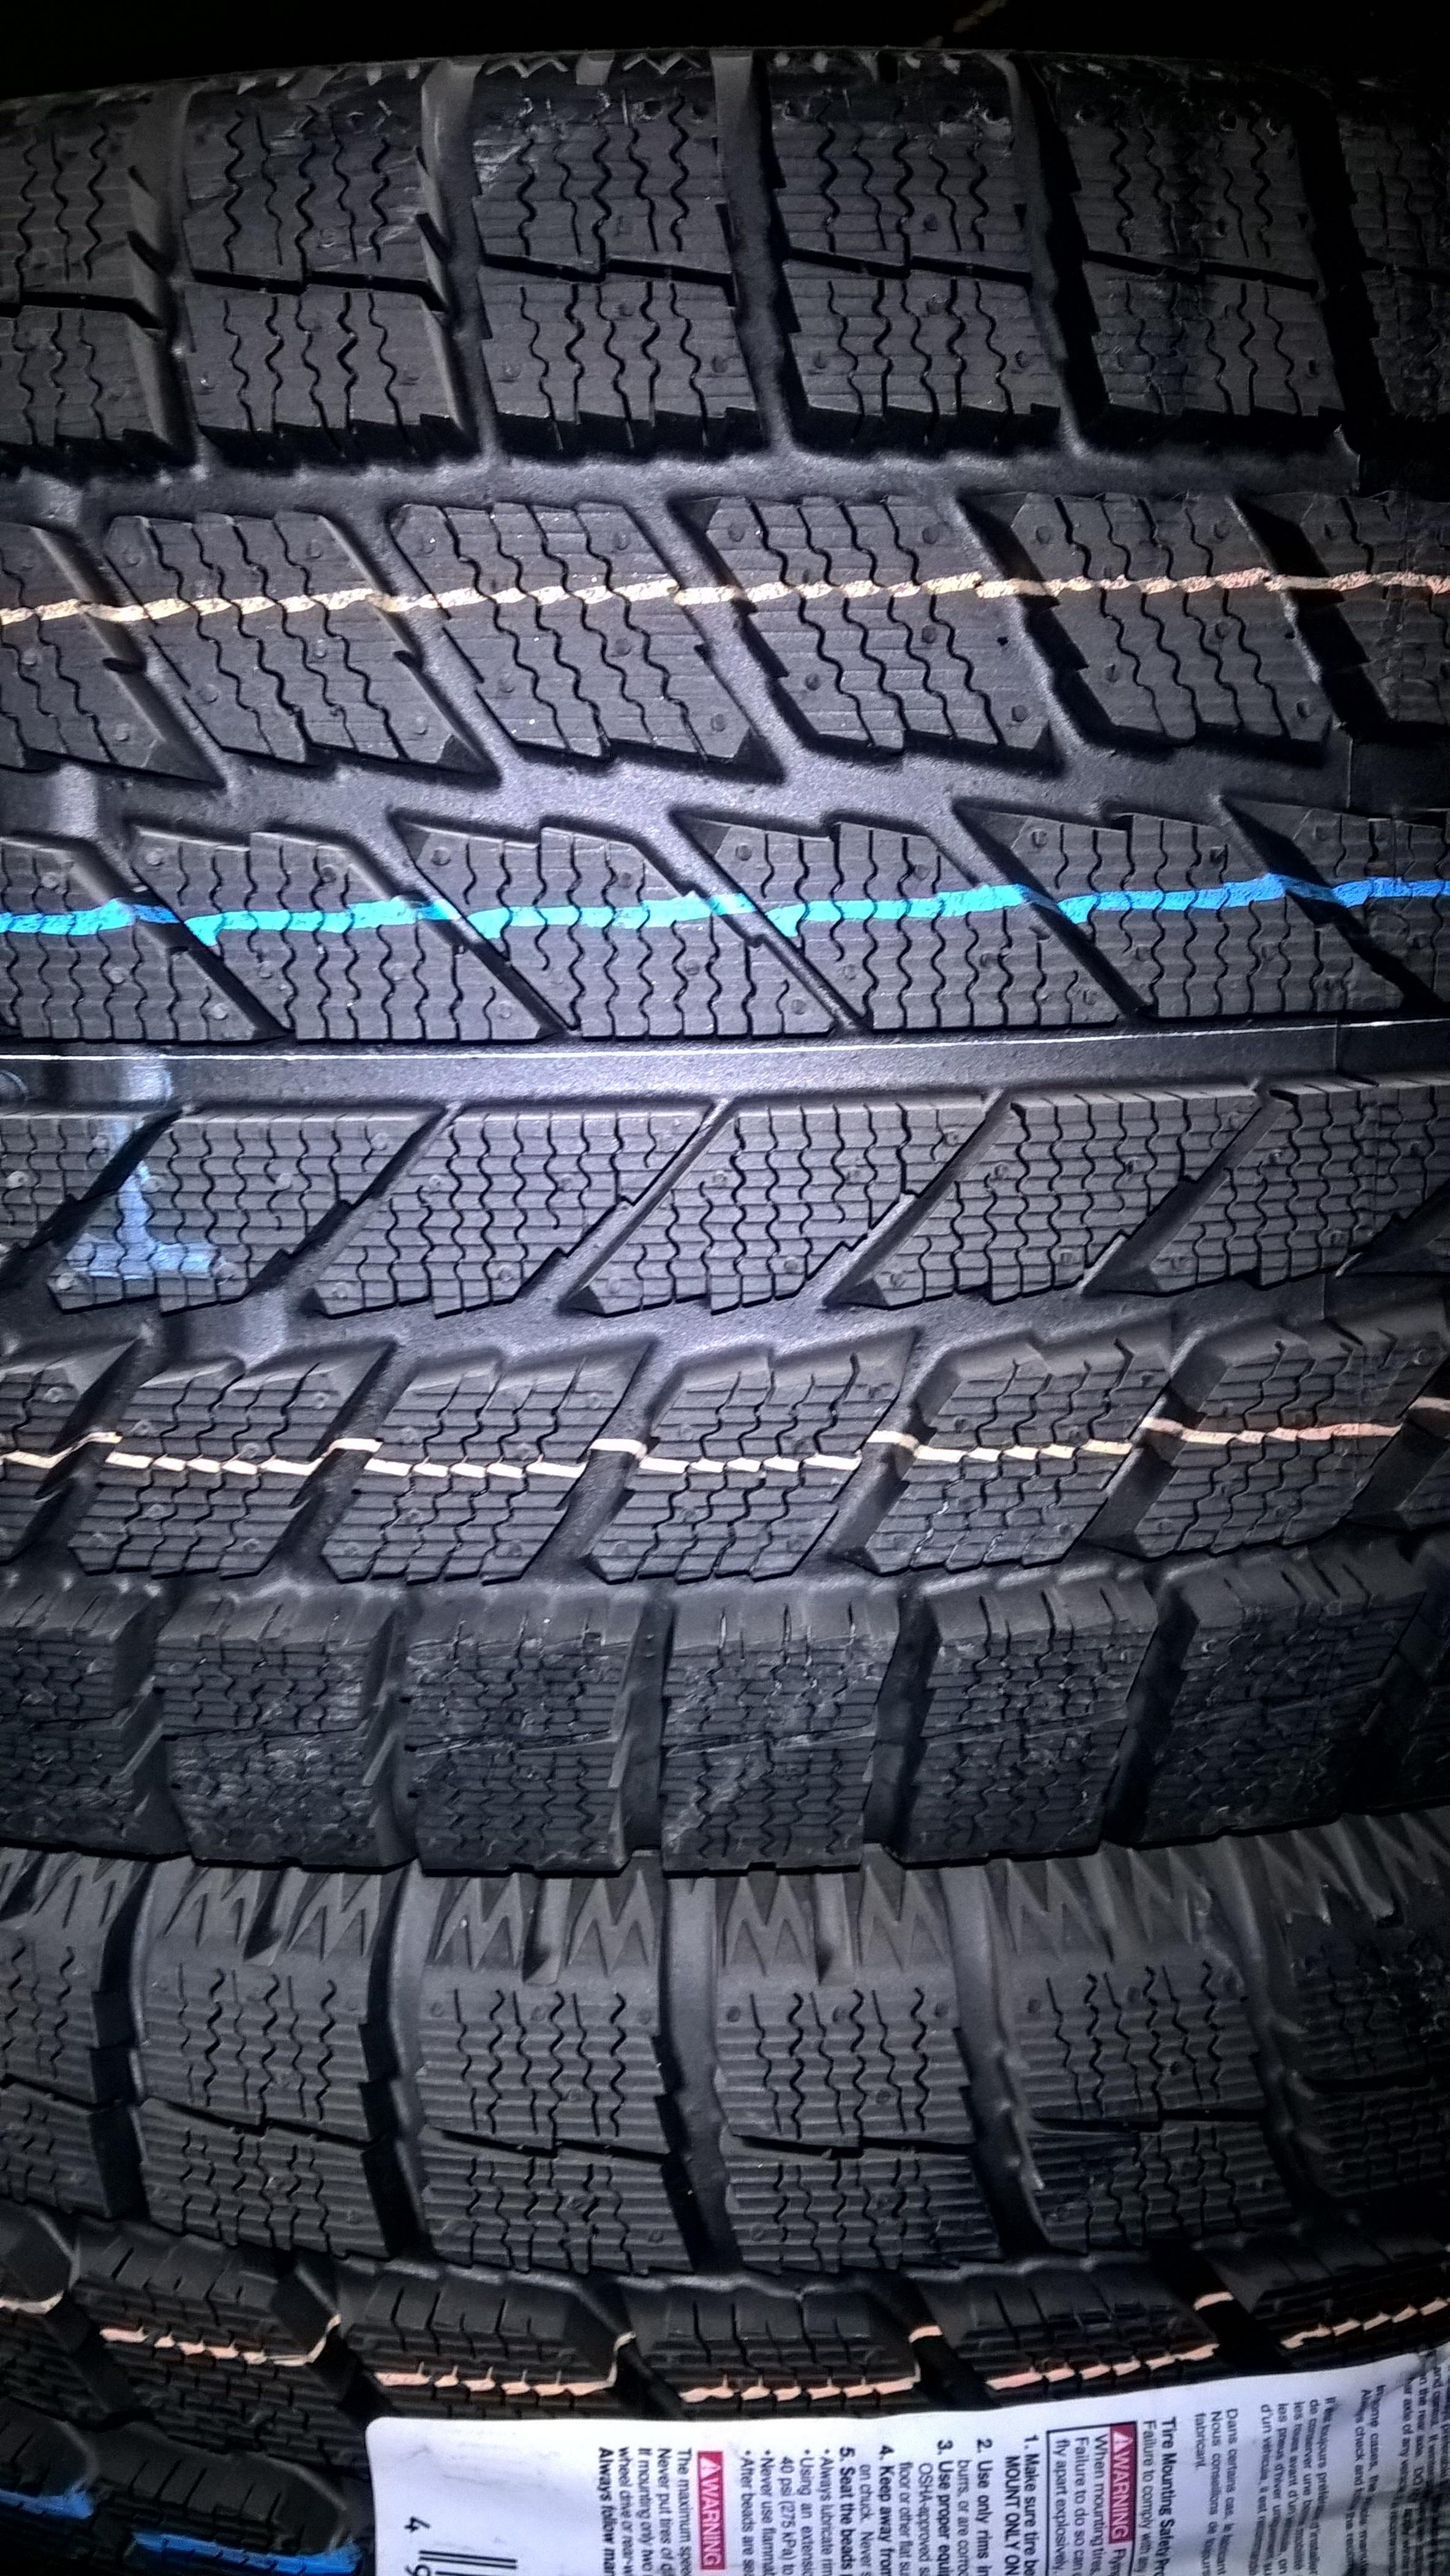 Toyo Tire Tread Detail